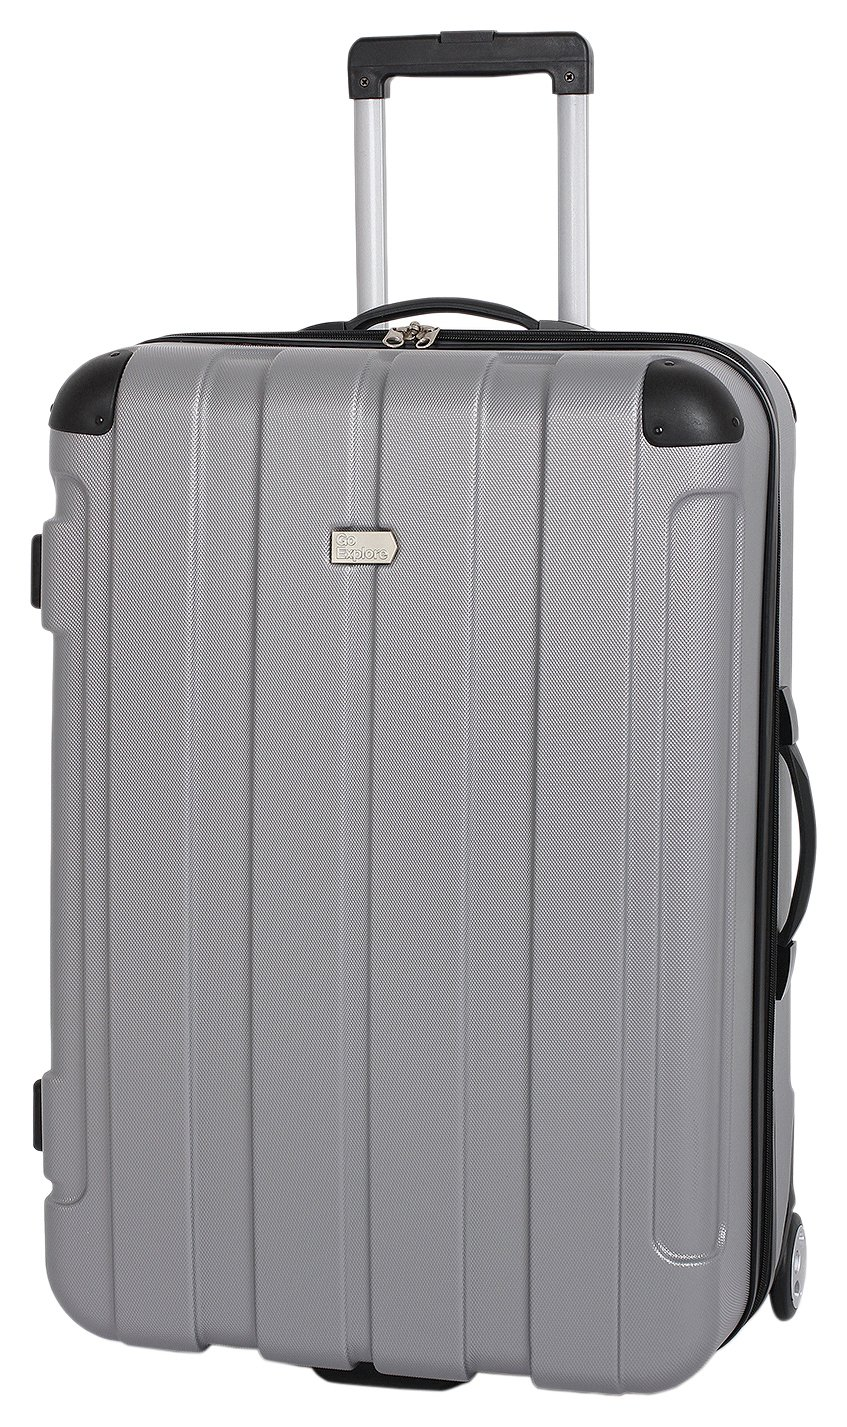 go-explore-hard-large-2-wheel-case-silver